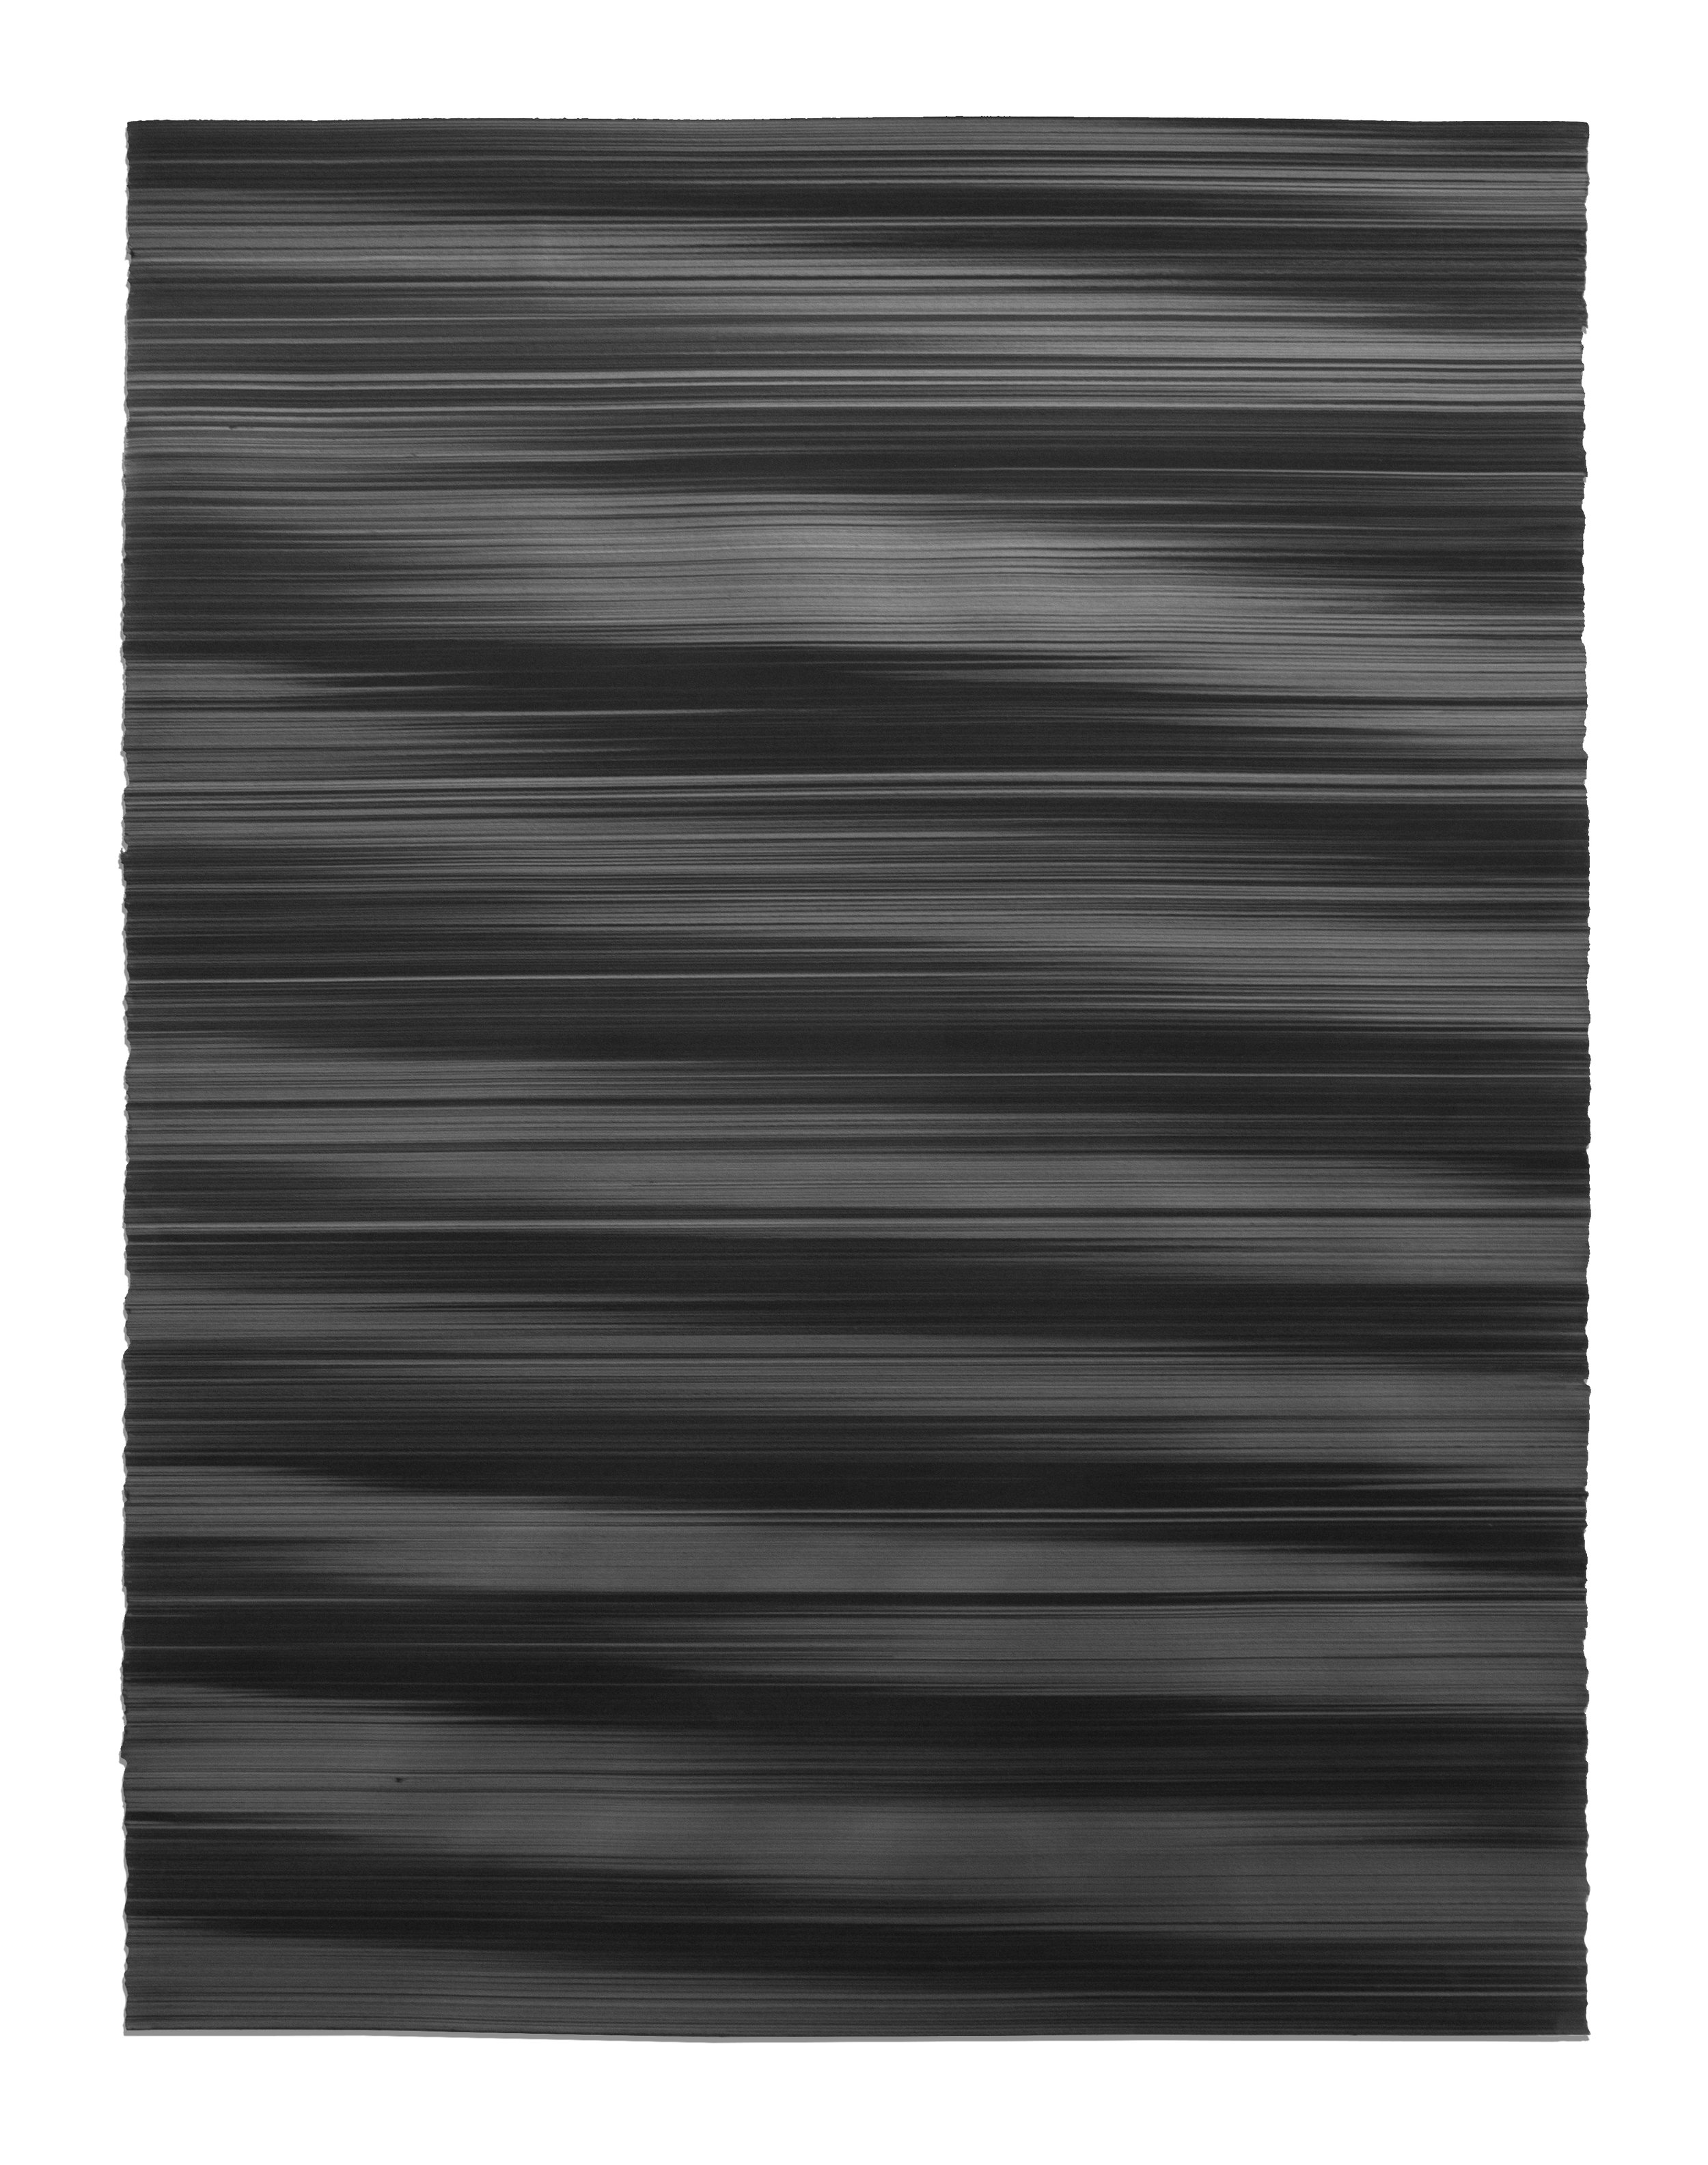 Waves in Black No. 2